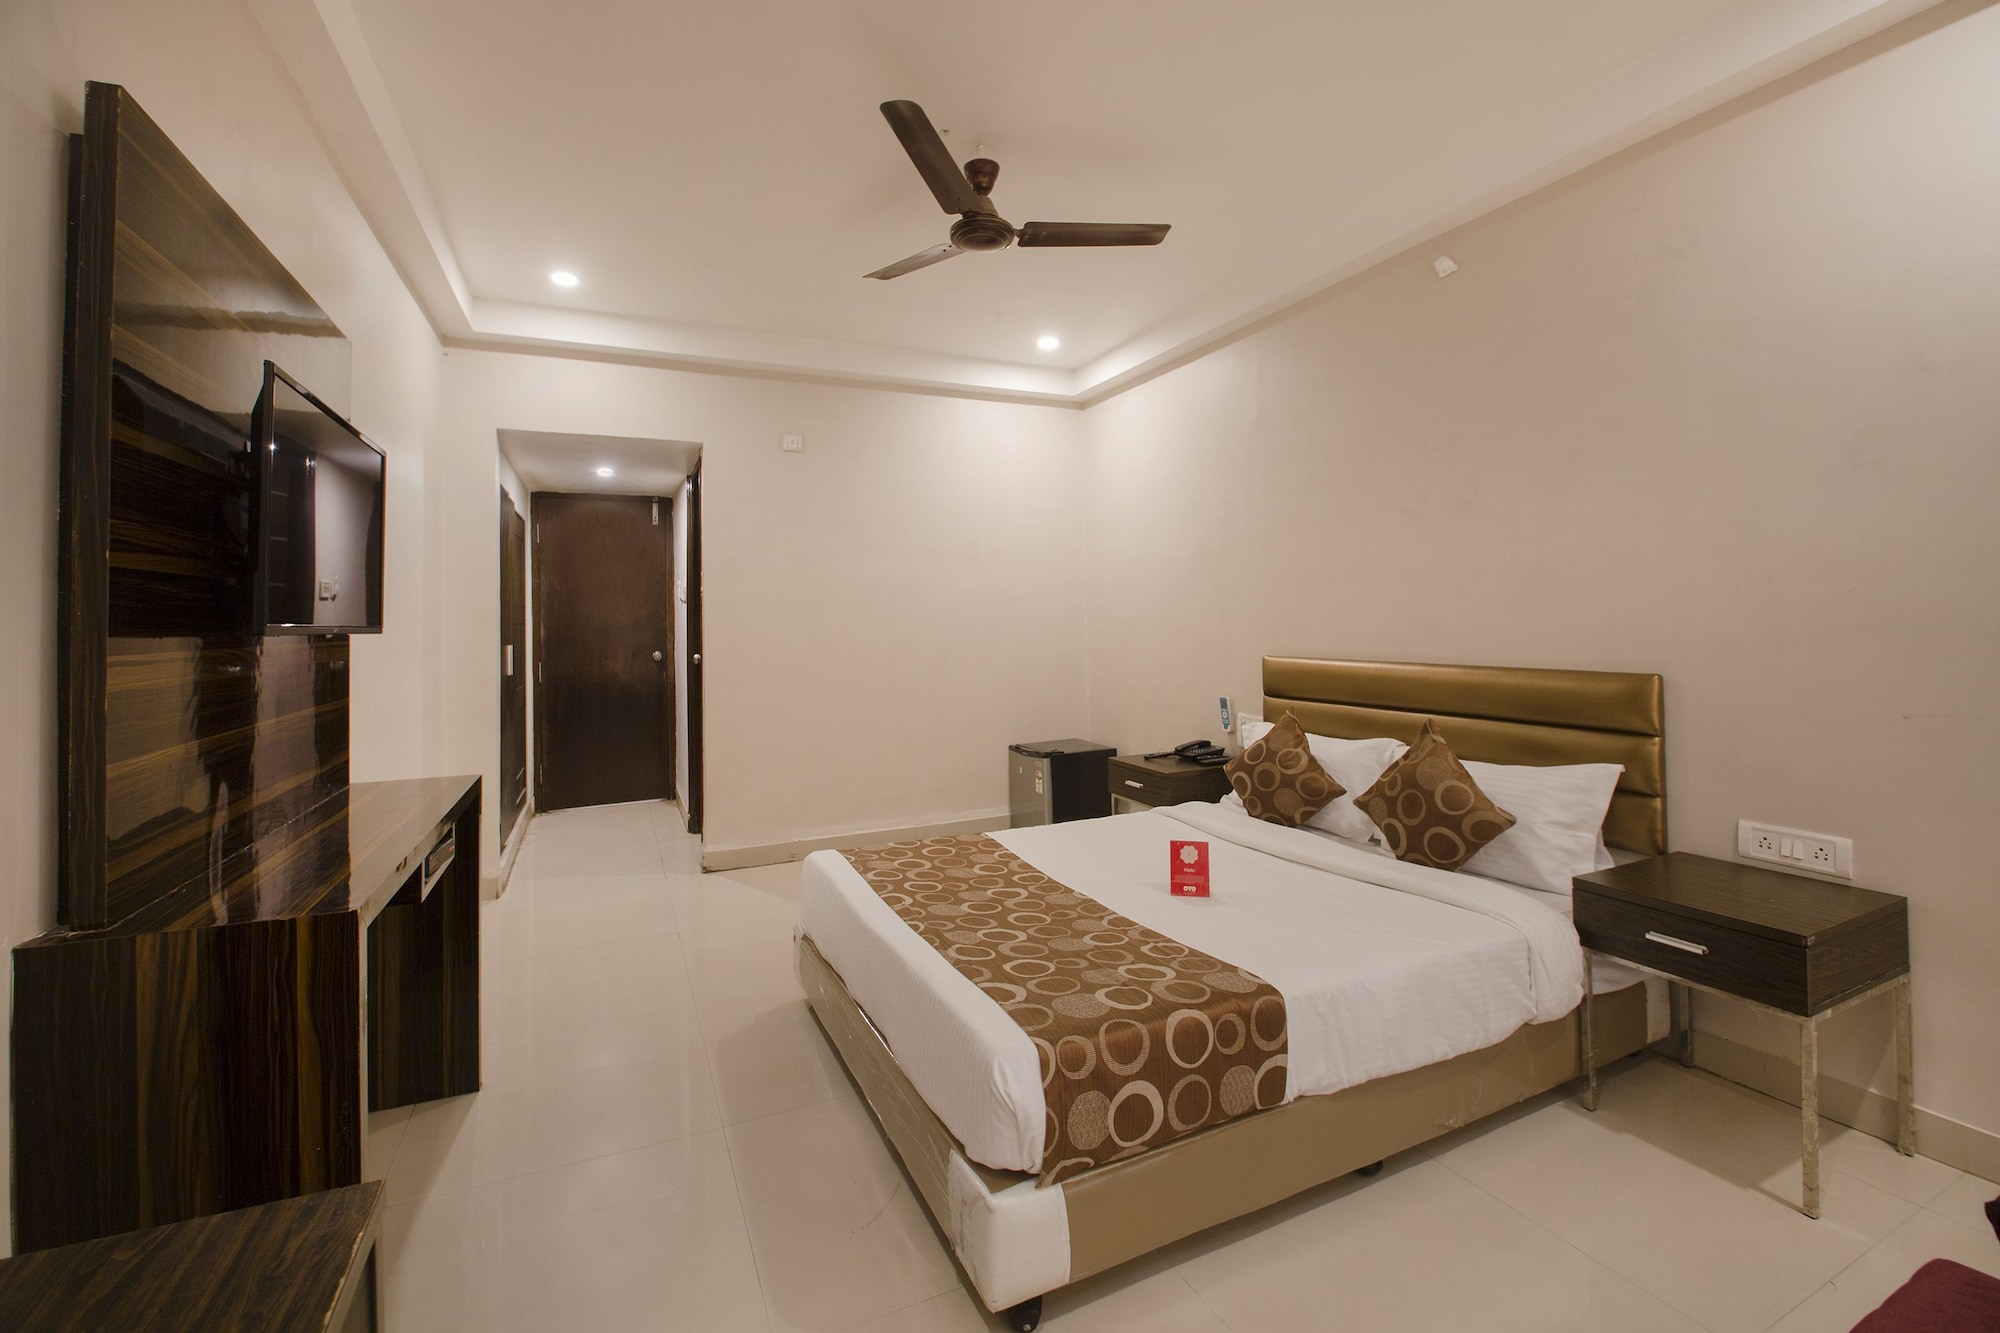 OYO 600 Hotel Skyhy, Hyderabad